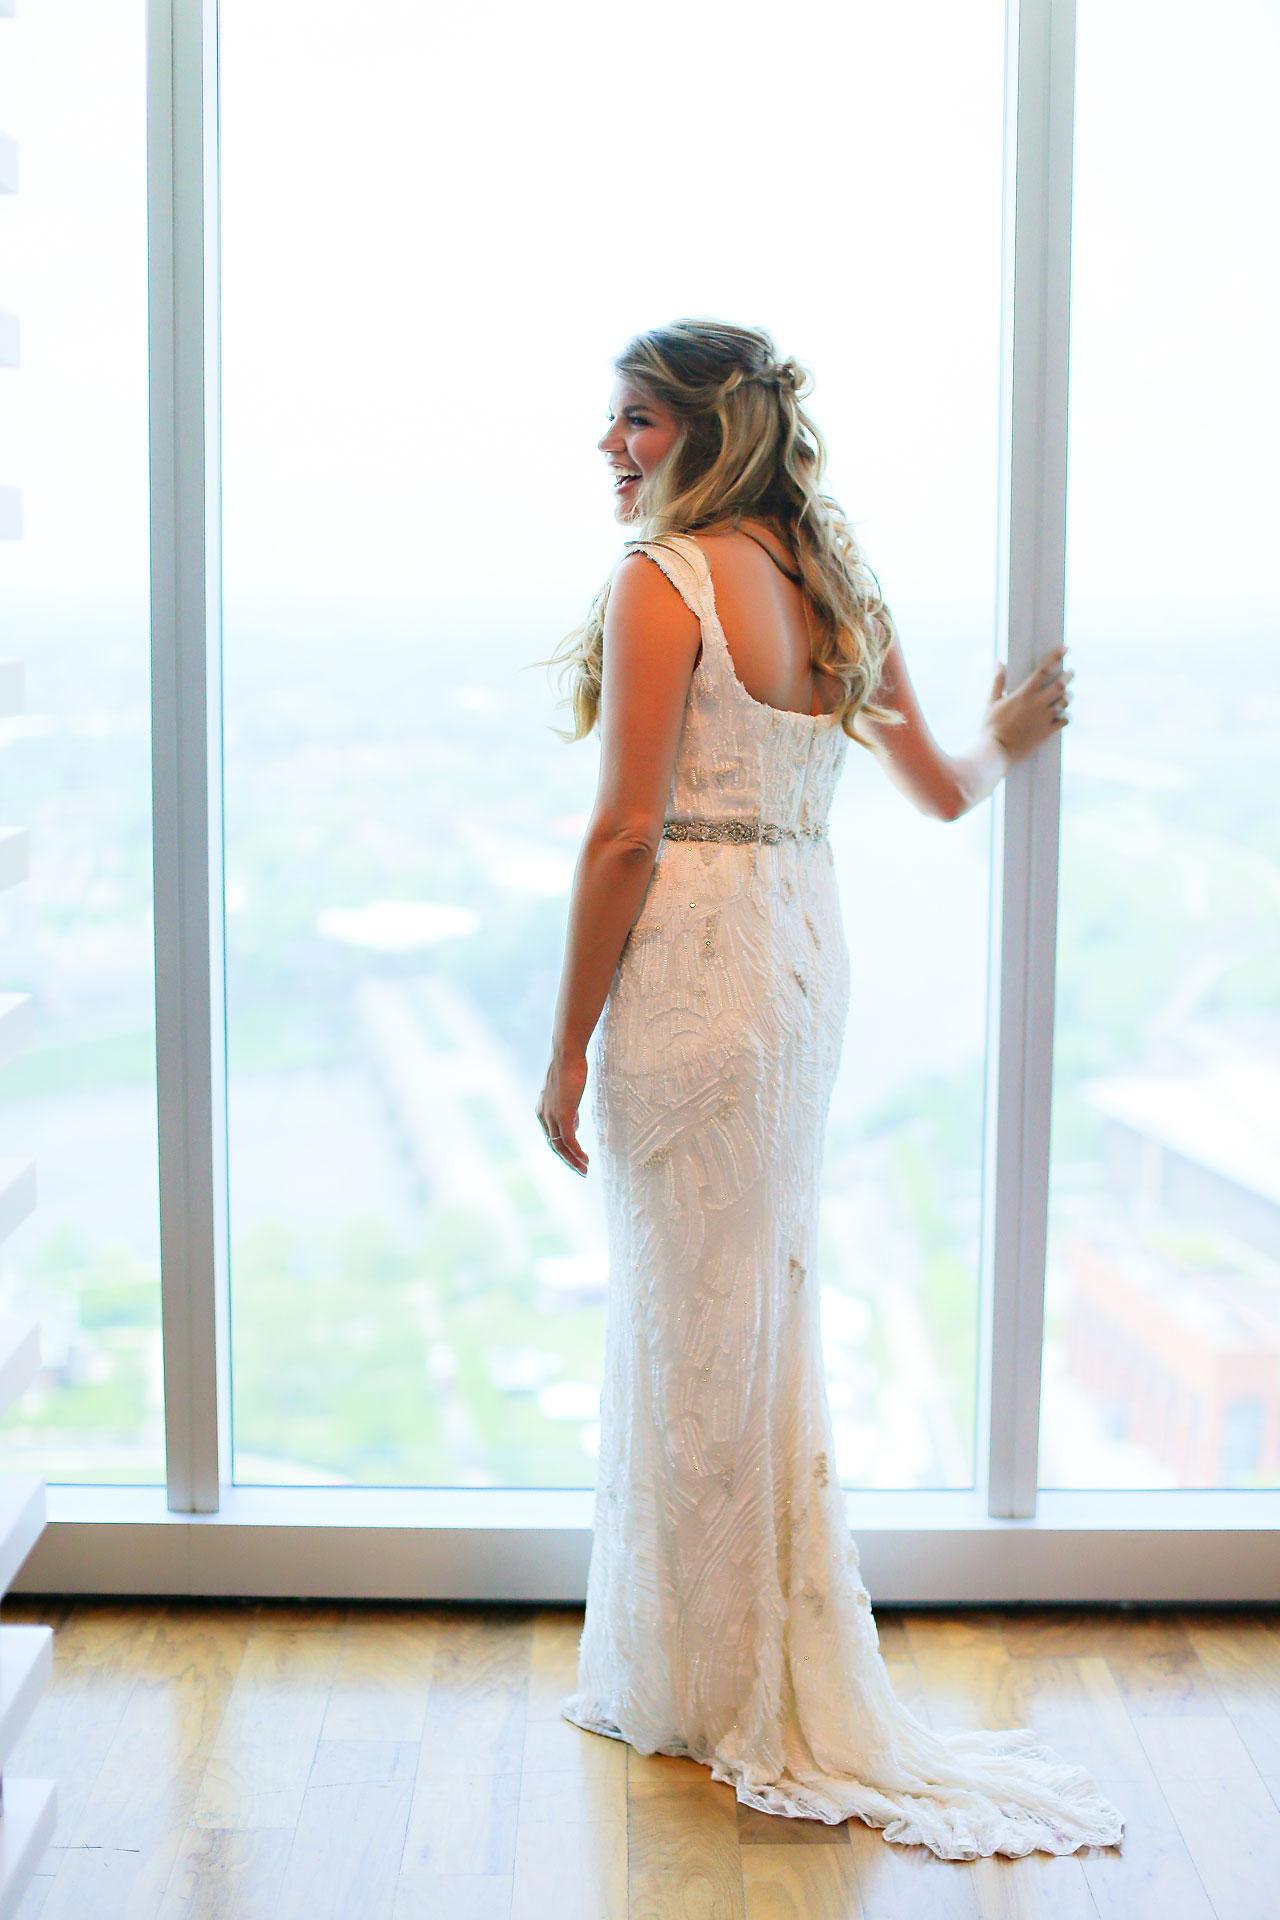 Amy Nick Canal 337 Wedding 037